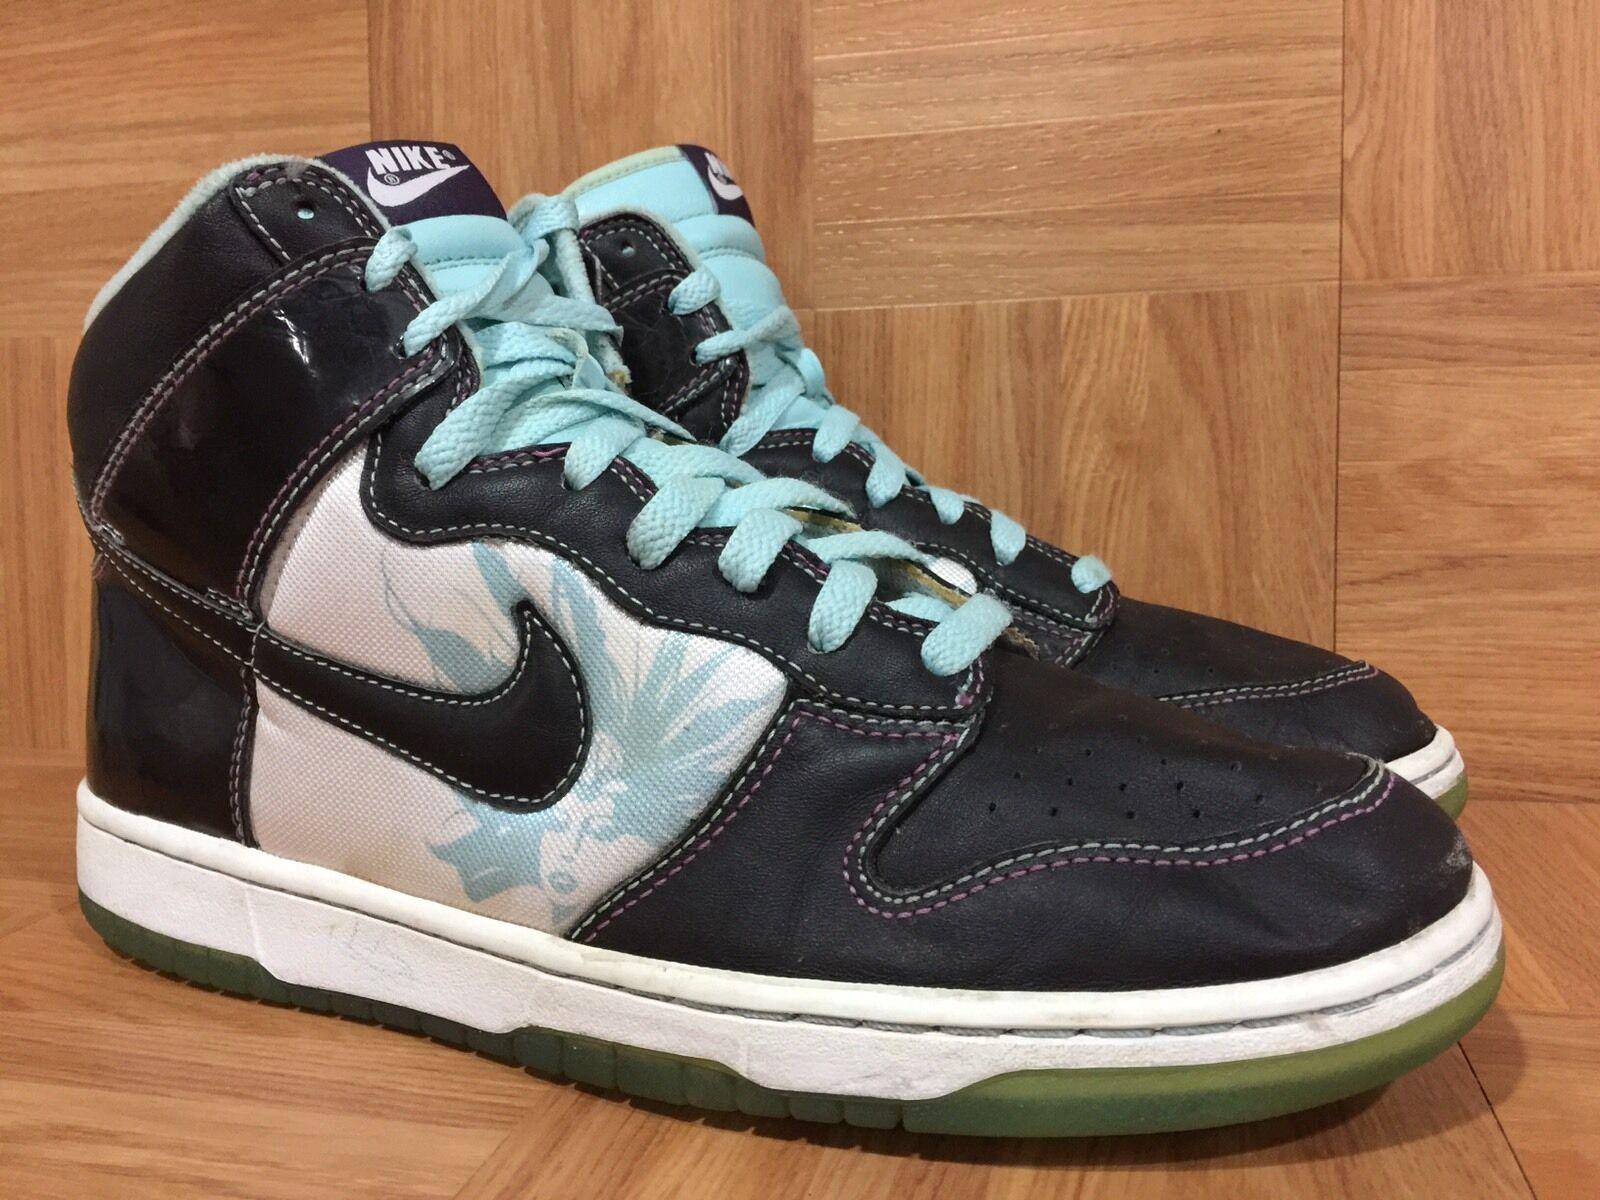 RARE  Nike Dunk High Premium Santana Black Glacier Blue Sz 10.5 312786-003 Worn